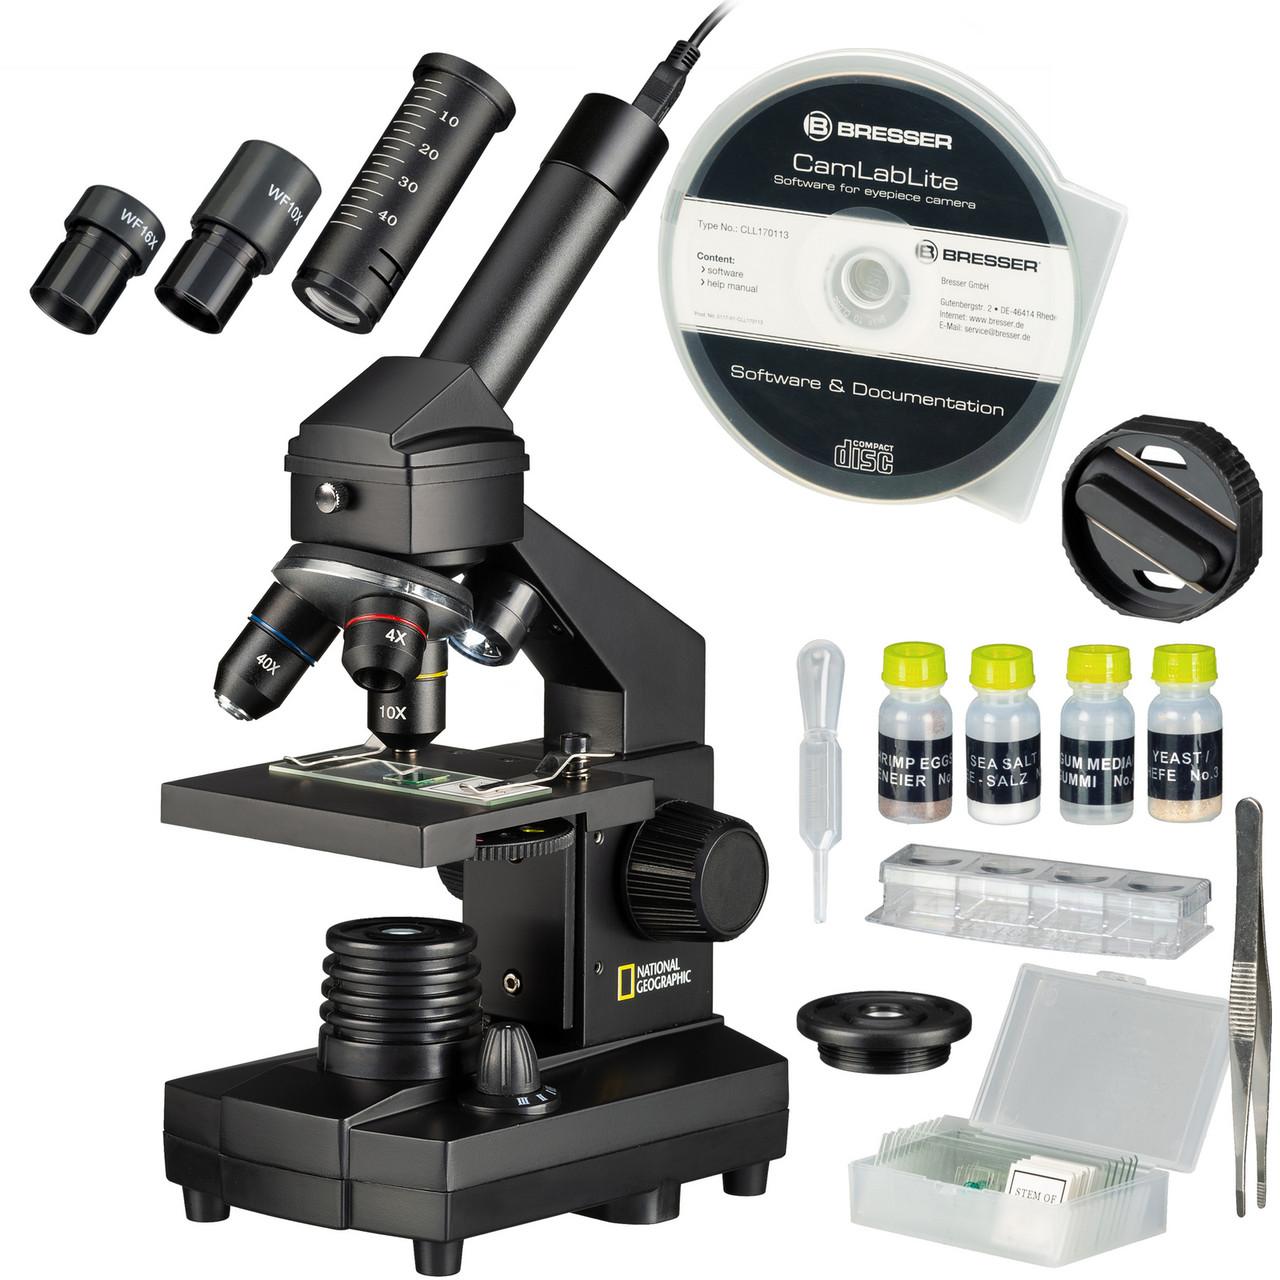 Микроскоп National Geographic 40x-1024x USB с кейсом (9039100)